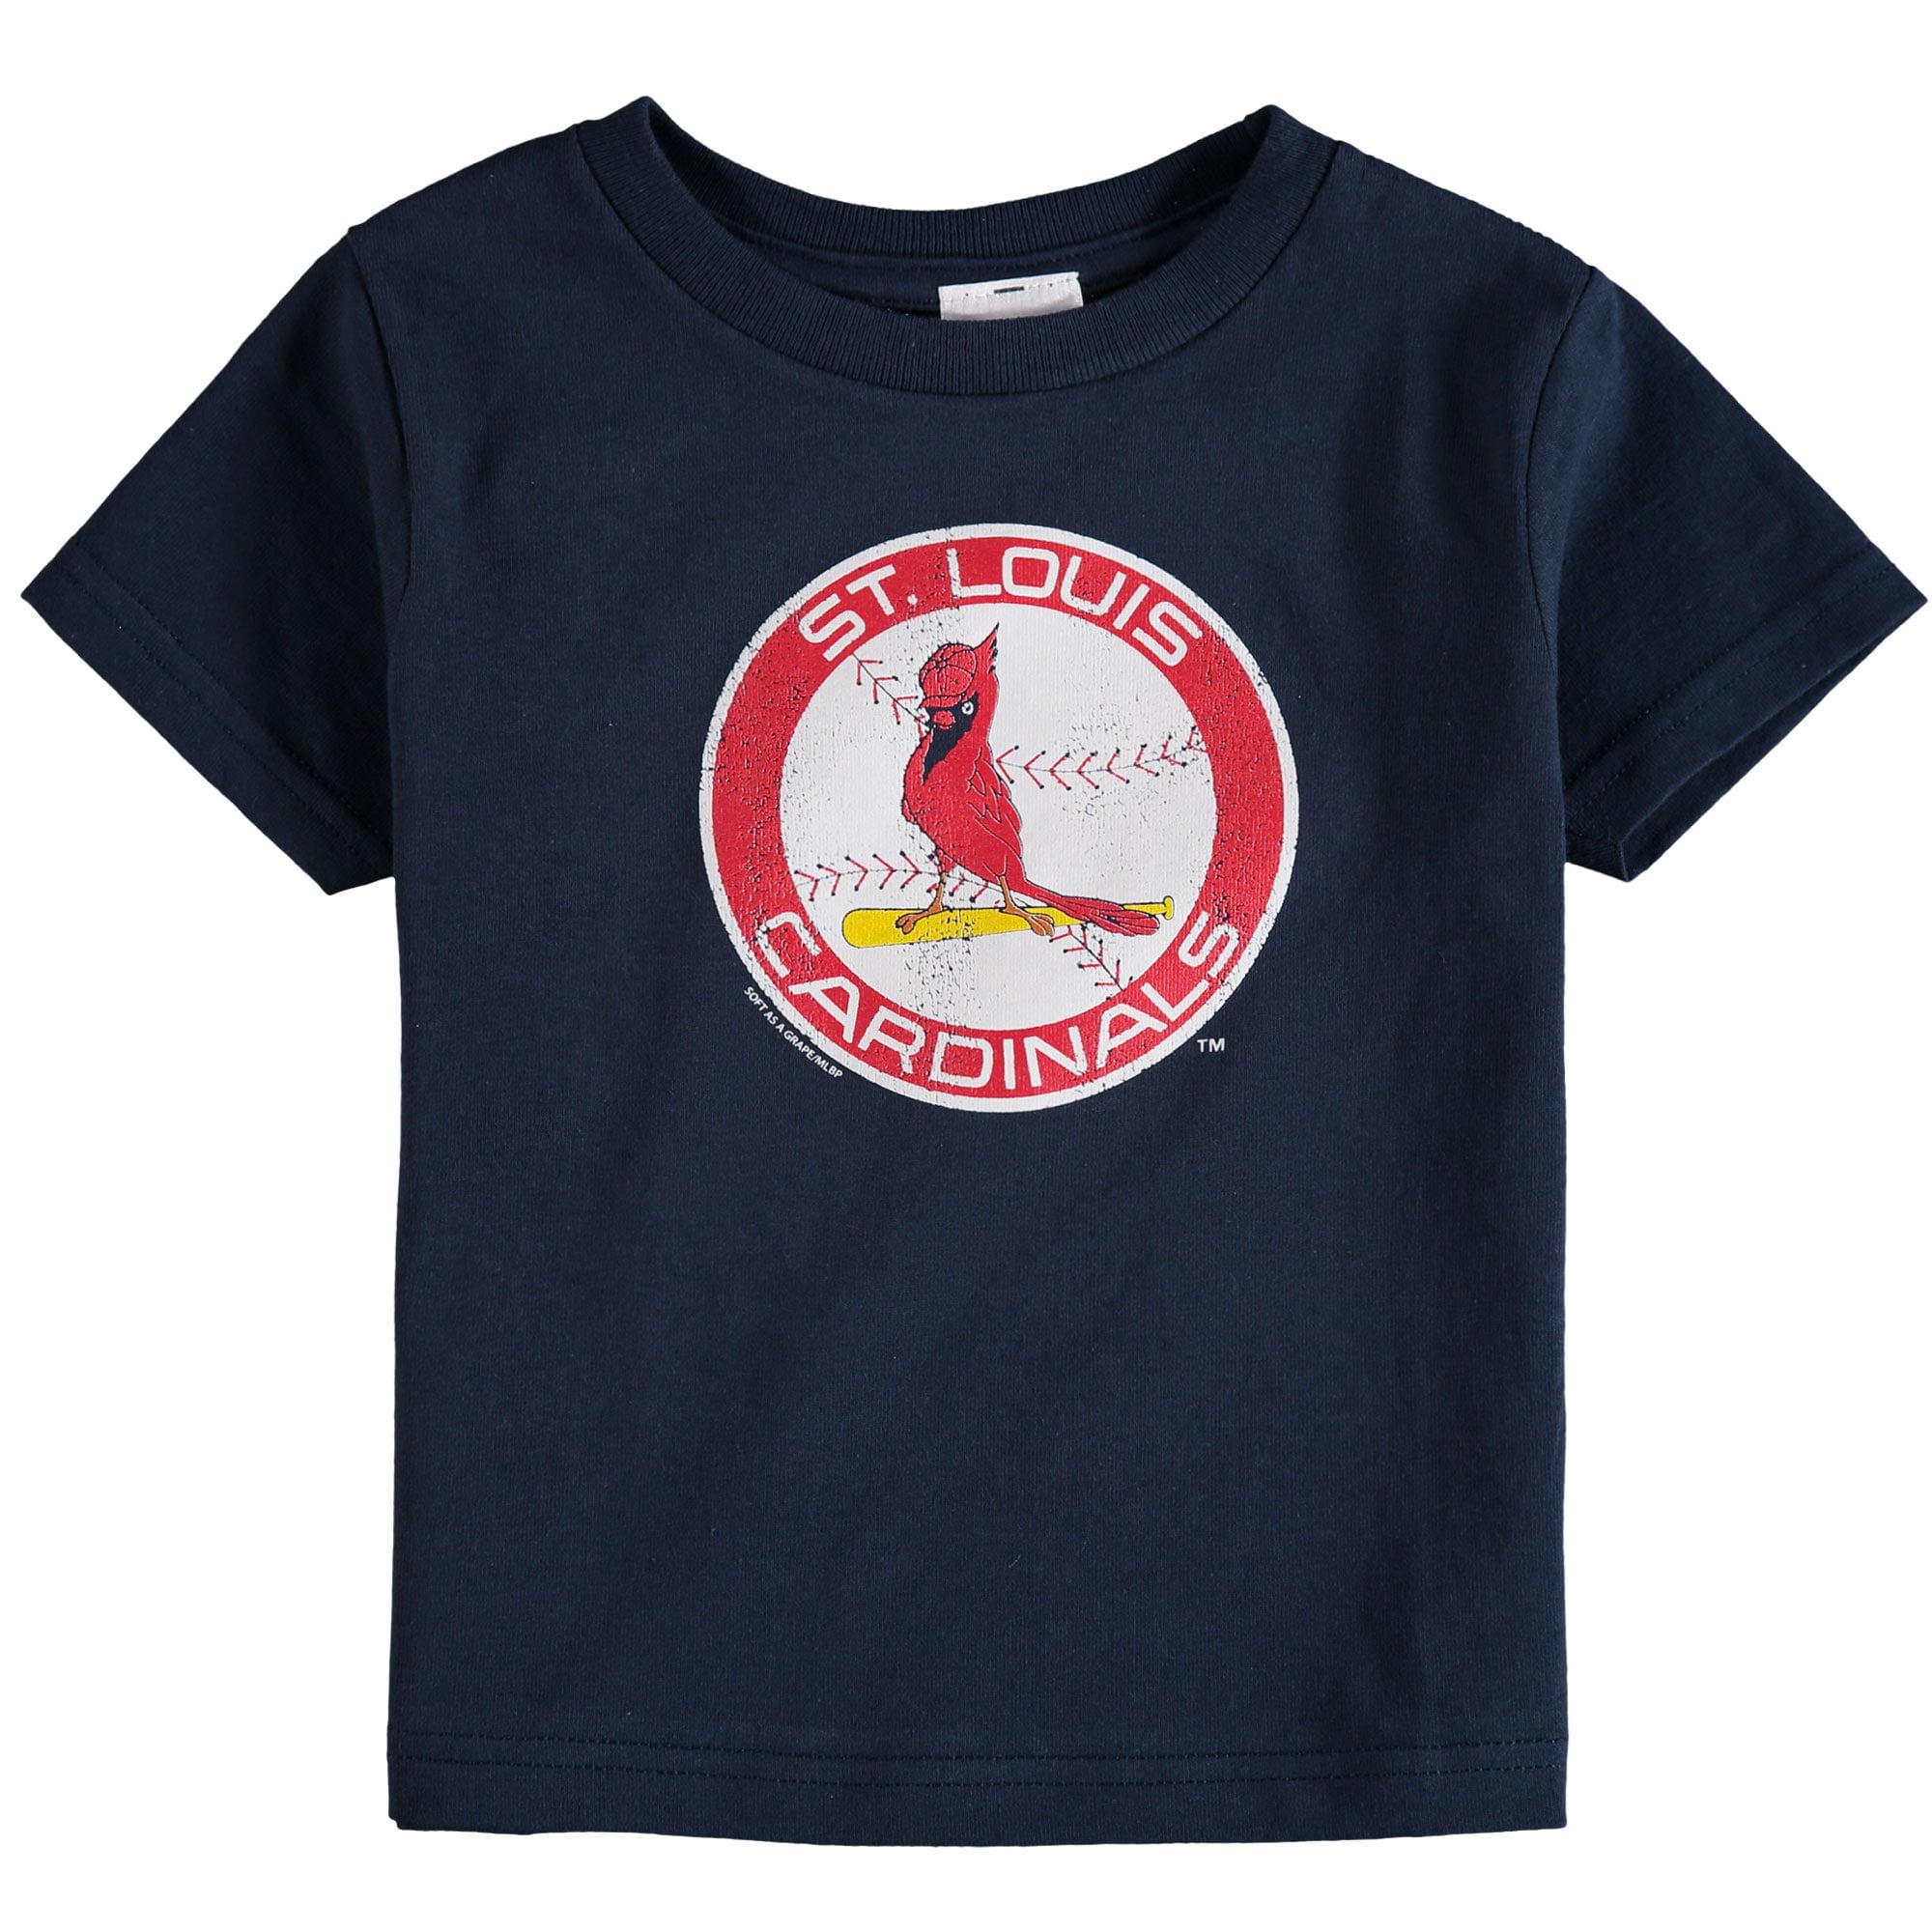 St. Louis Cardinals Soft As A Grape Toddler Cooperstown Collection Shutout T-Shirt - Navy